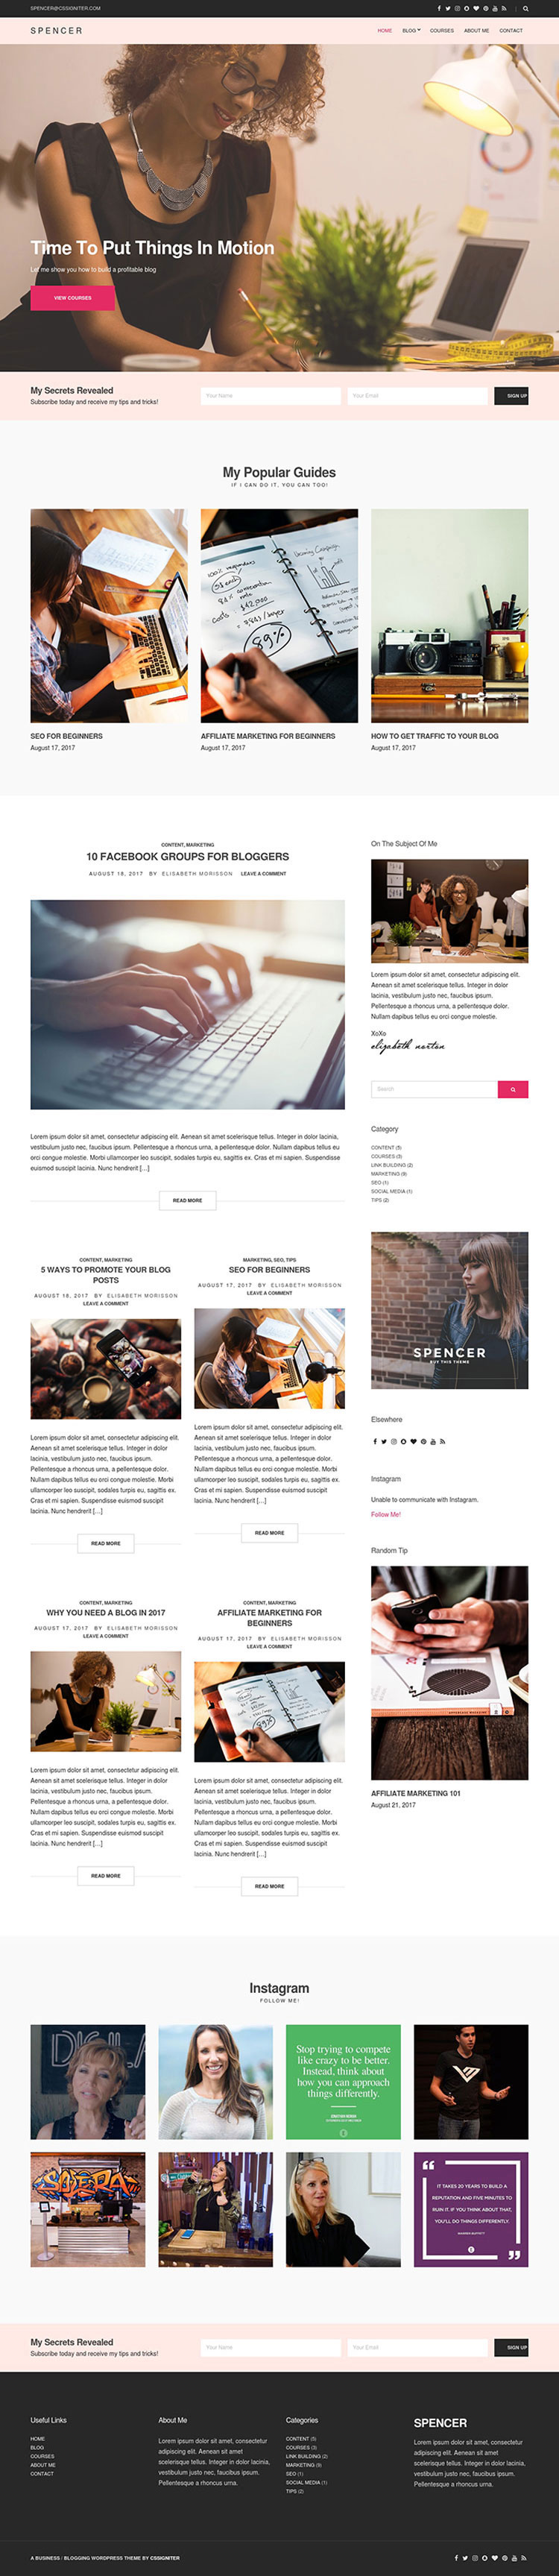 Pin by Explore Theme on WordPress | Pinterest | Wordpress and ...